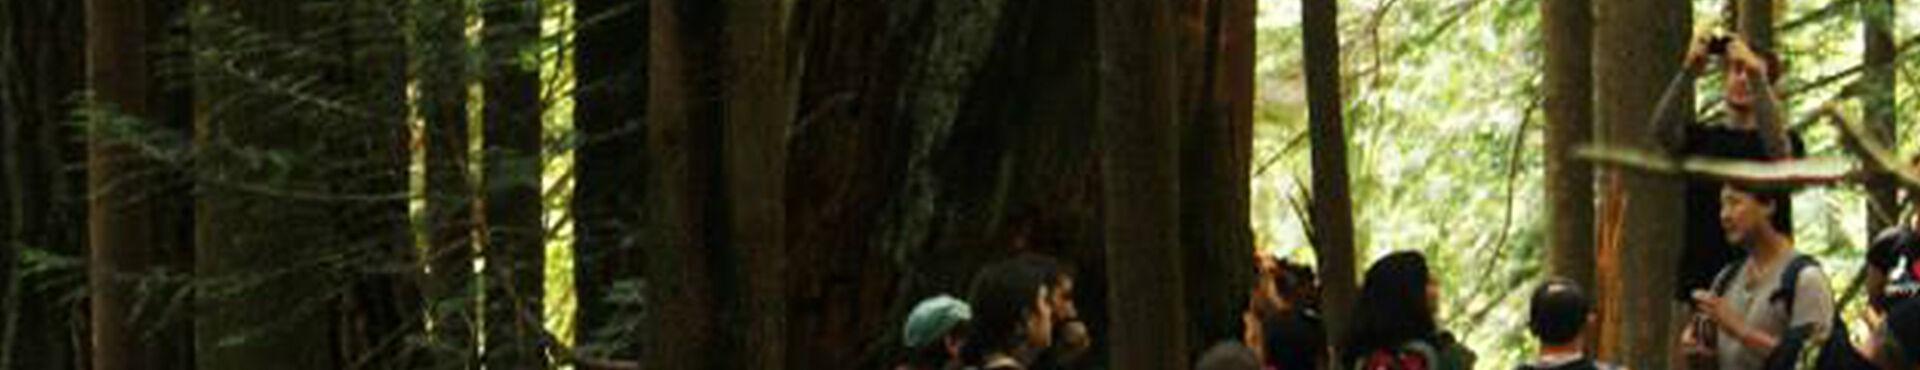 Banner - Ancient Forest Alliance